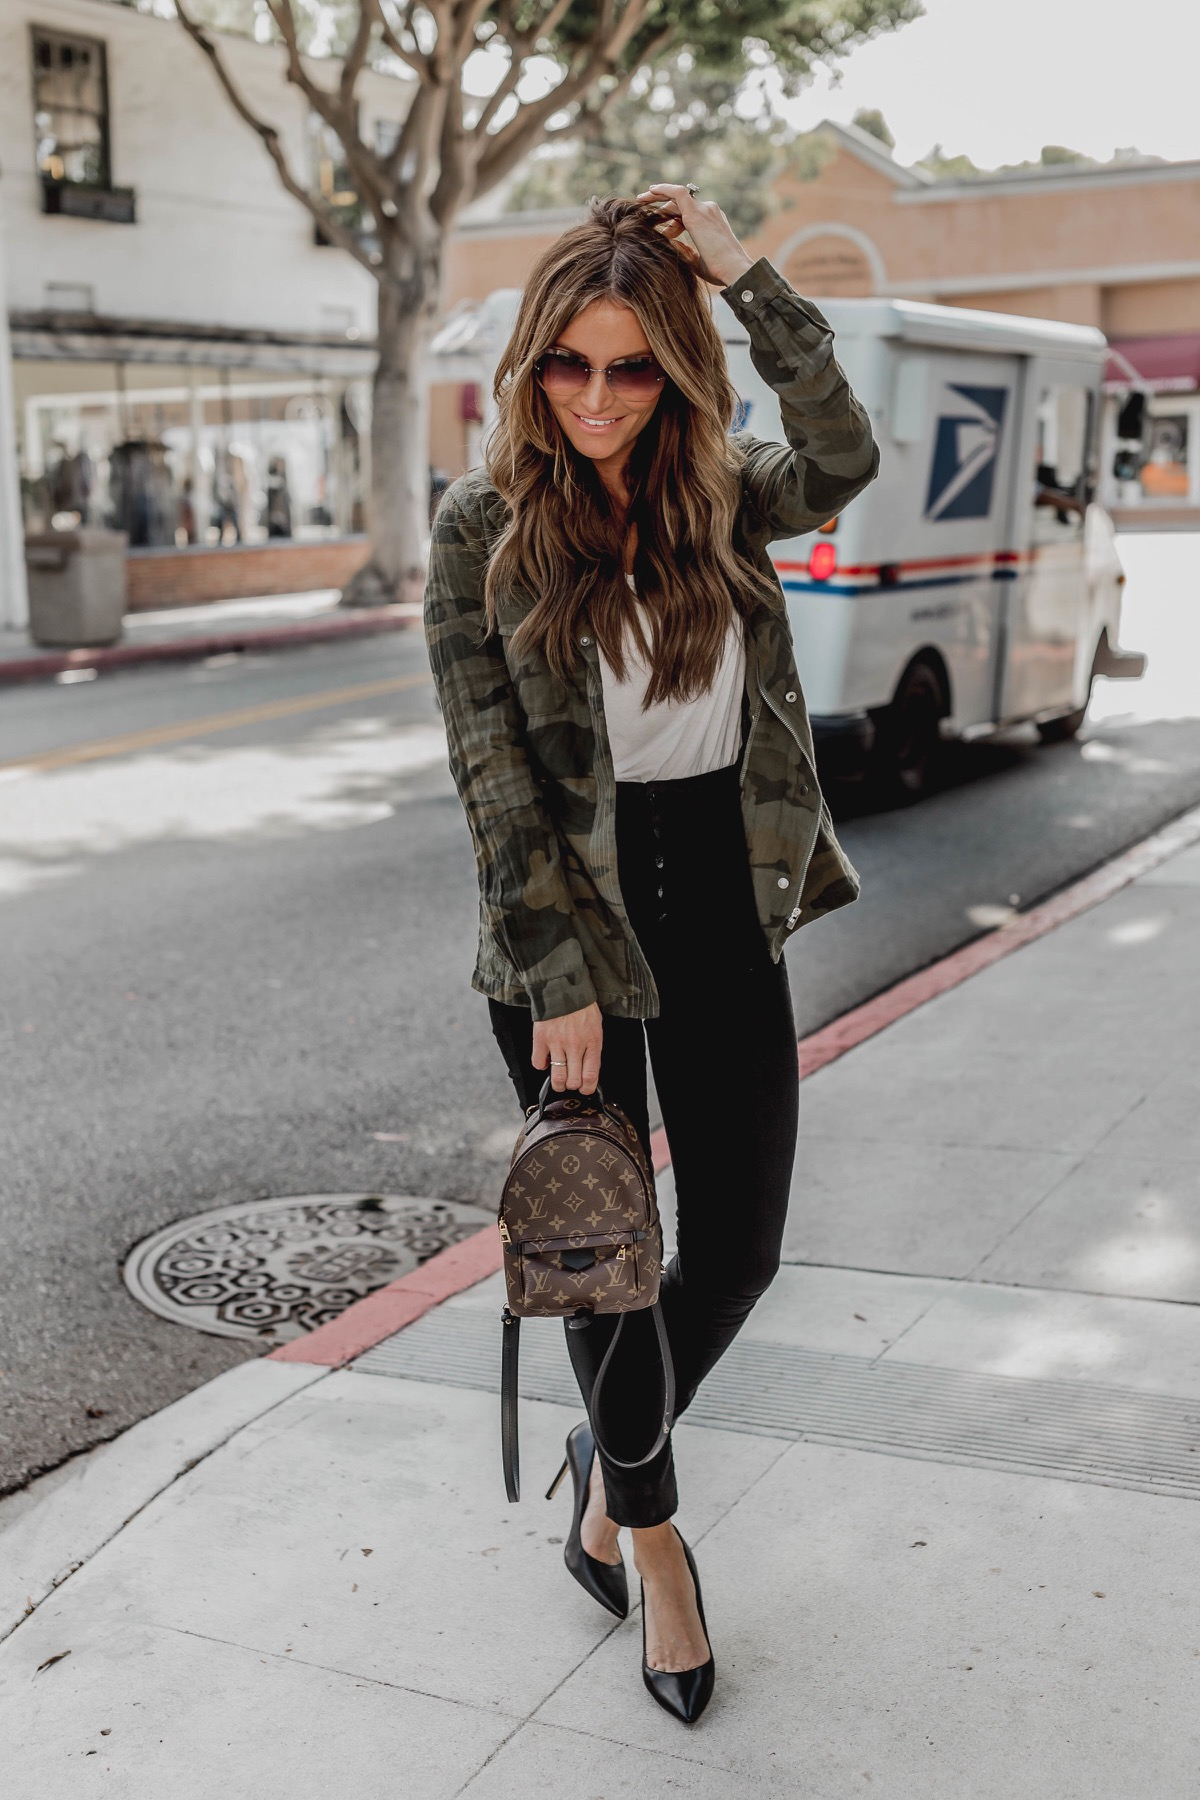 d7240daaad9f9 Camo Jacket Style #DKWFashion Friday   DKW Styling